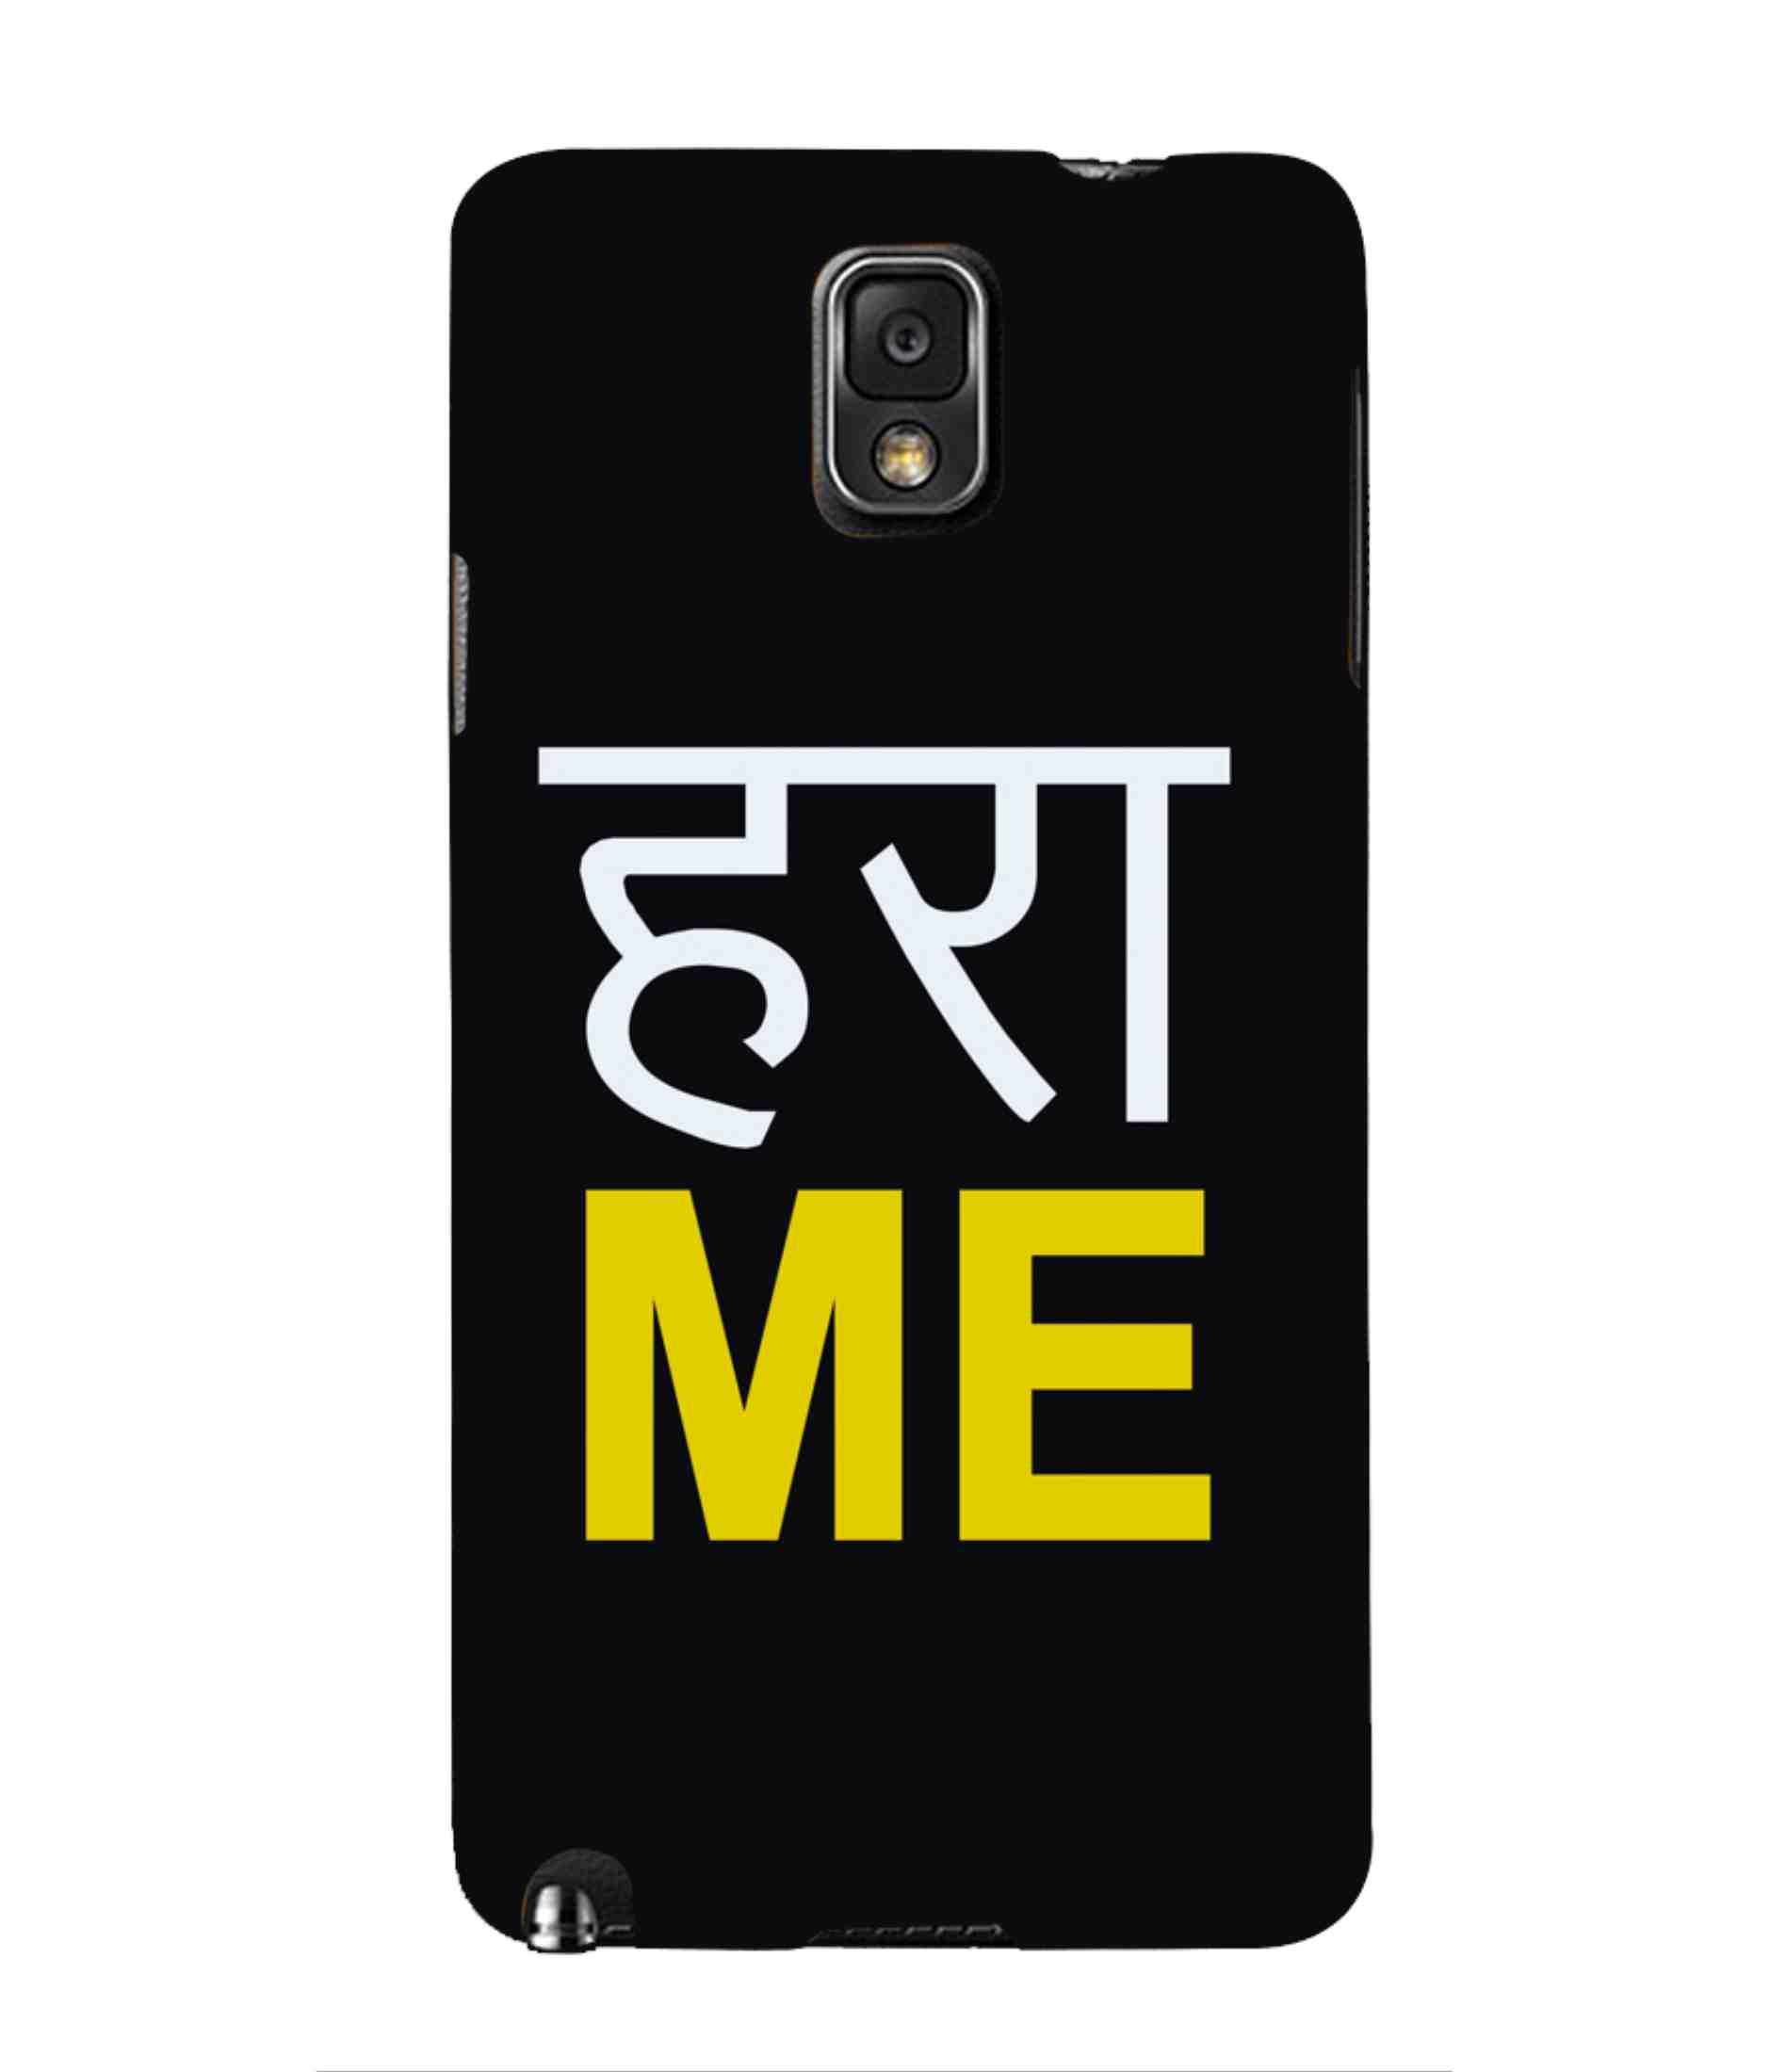 Vibrante Mobile Case Cover For Samsung Galaxy Note 3 , Samsung Galaxy Note Iii , Samsung Galaxy Note 3 N9002 , Samsung Galaxy Note N9000 N9005 28883